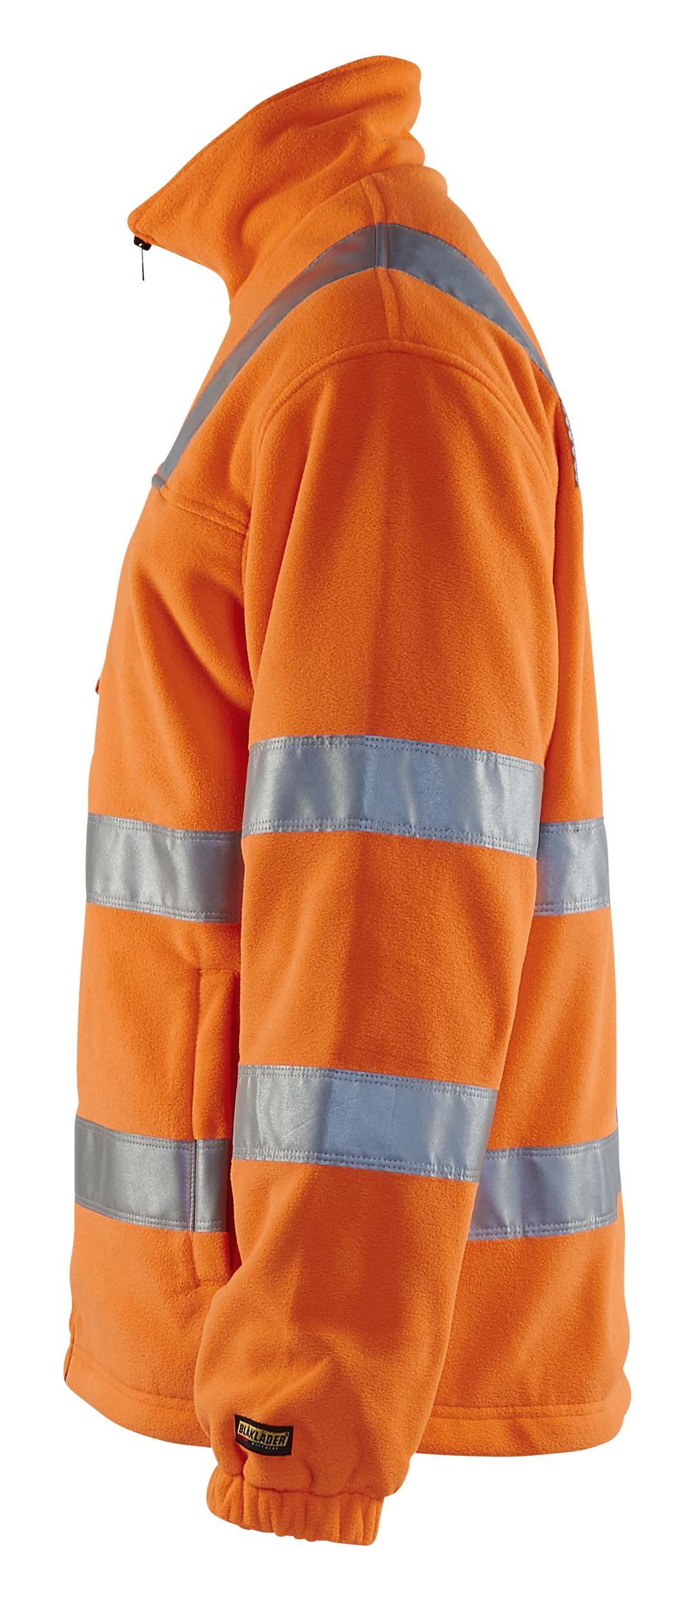 Blaklader Vesten 48532560 High Vis oranje(5300)